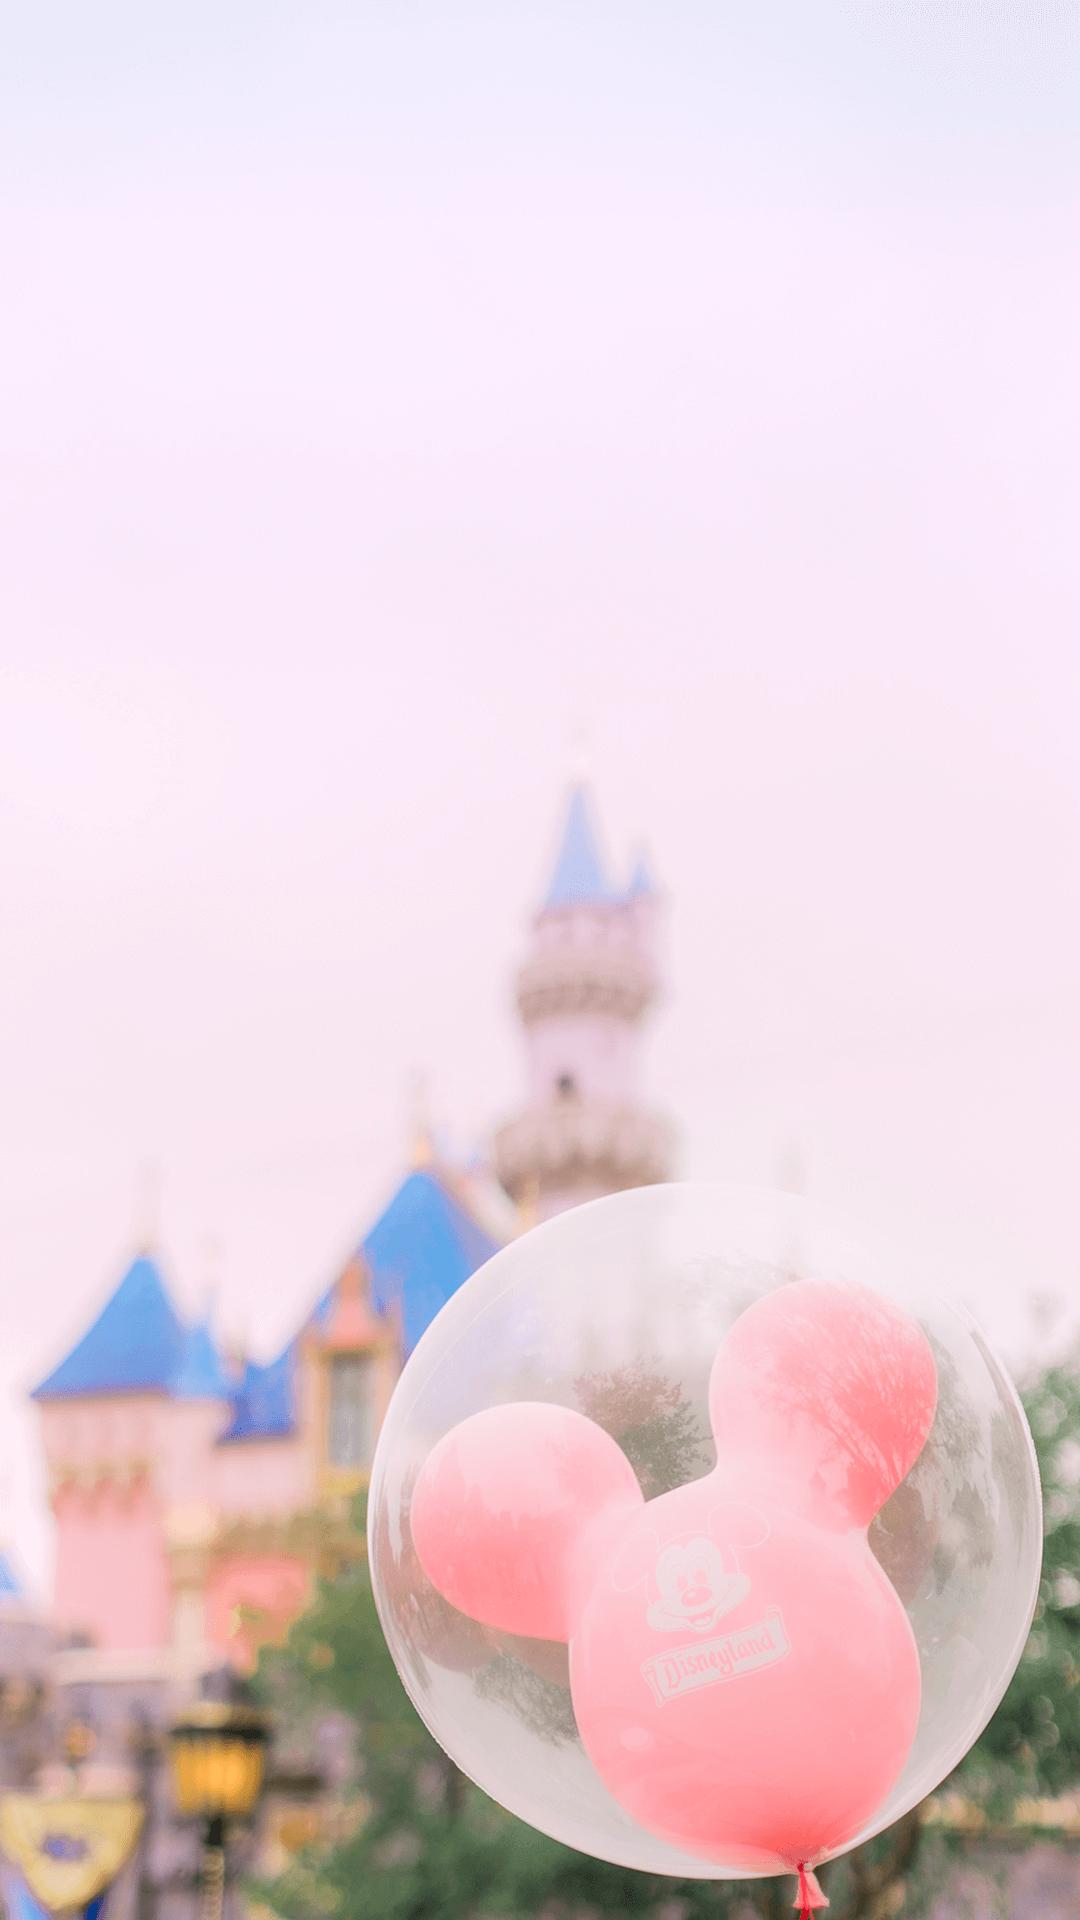 Tech Love 06: Dreamy Disneyland Wallpapers ~ Emmygination